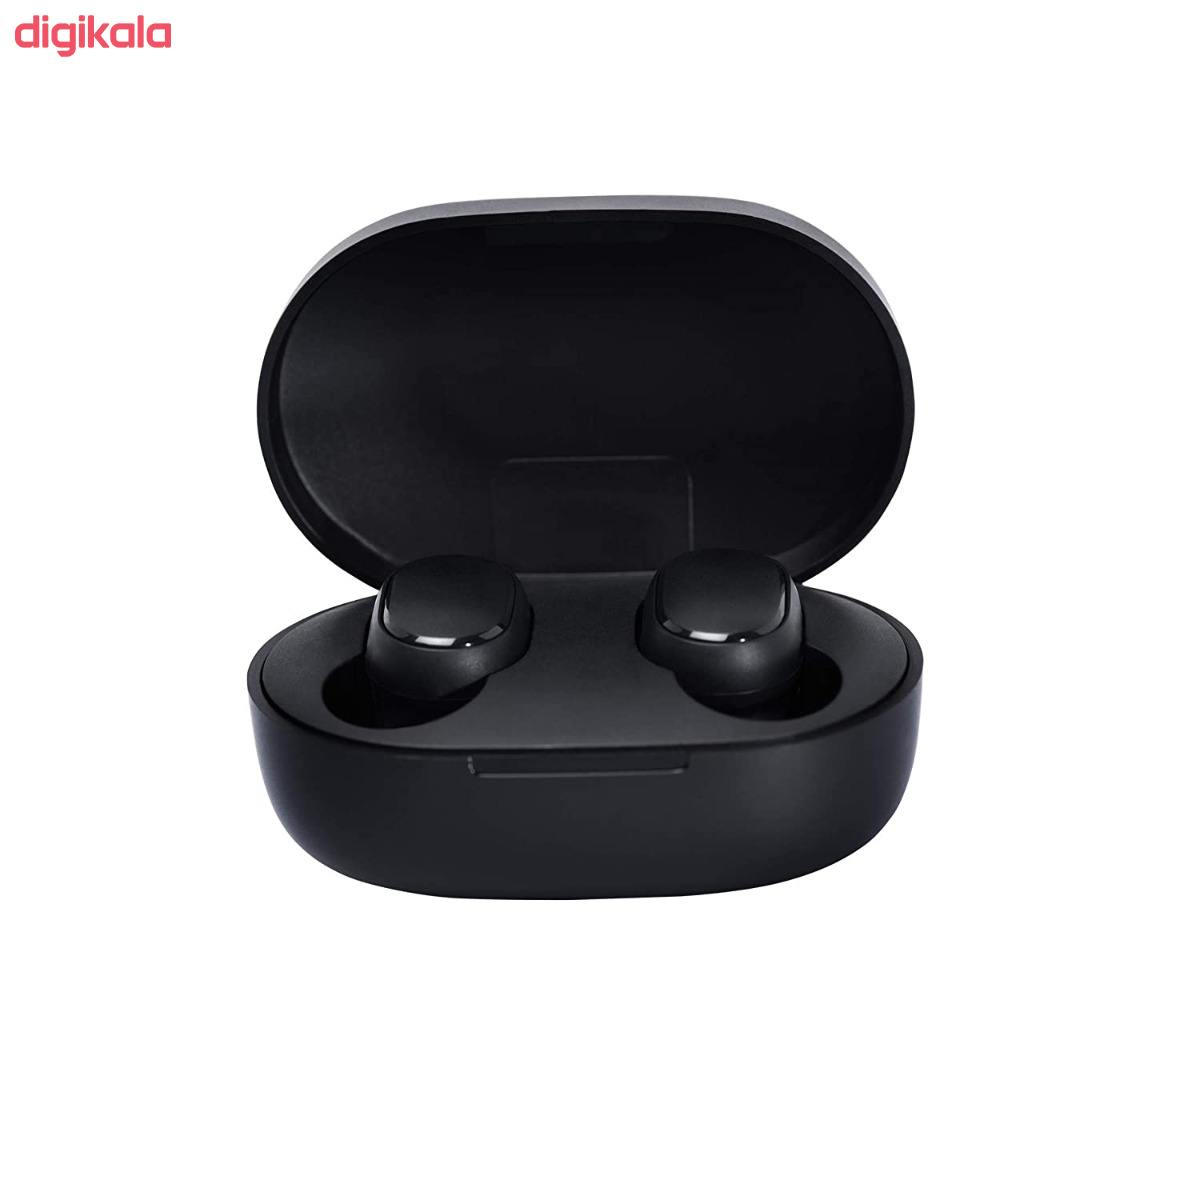 هدفون بی سیم مدل Earbuds Basic main 1 3